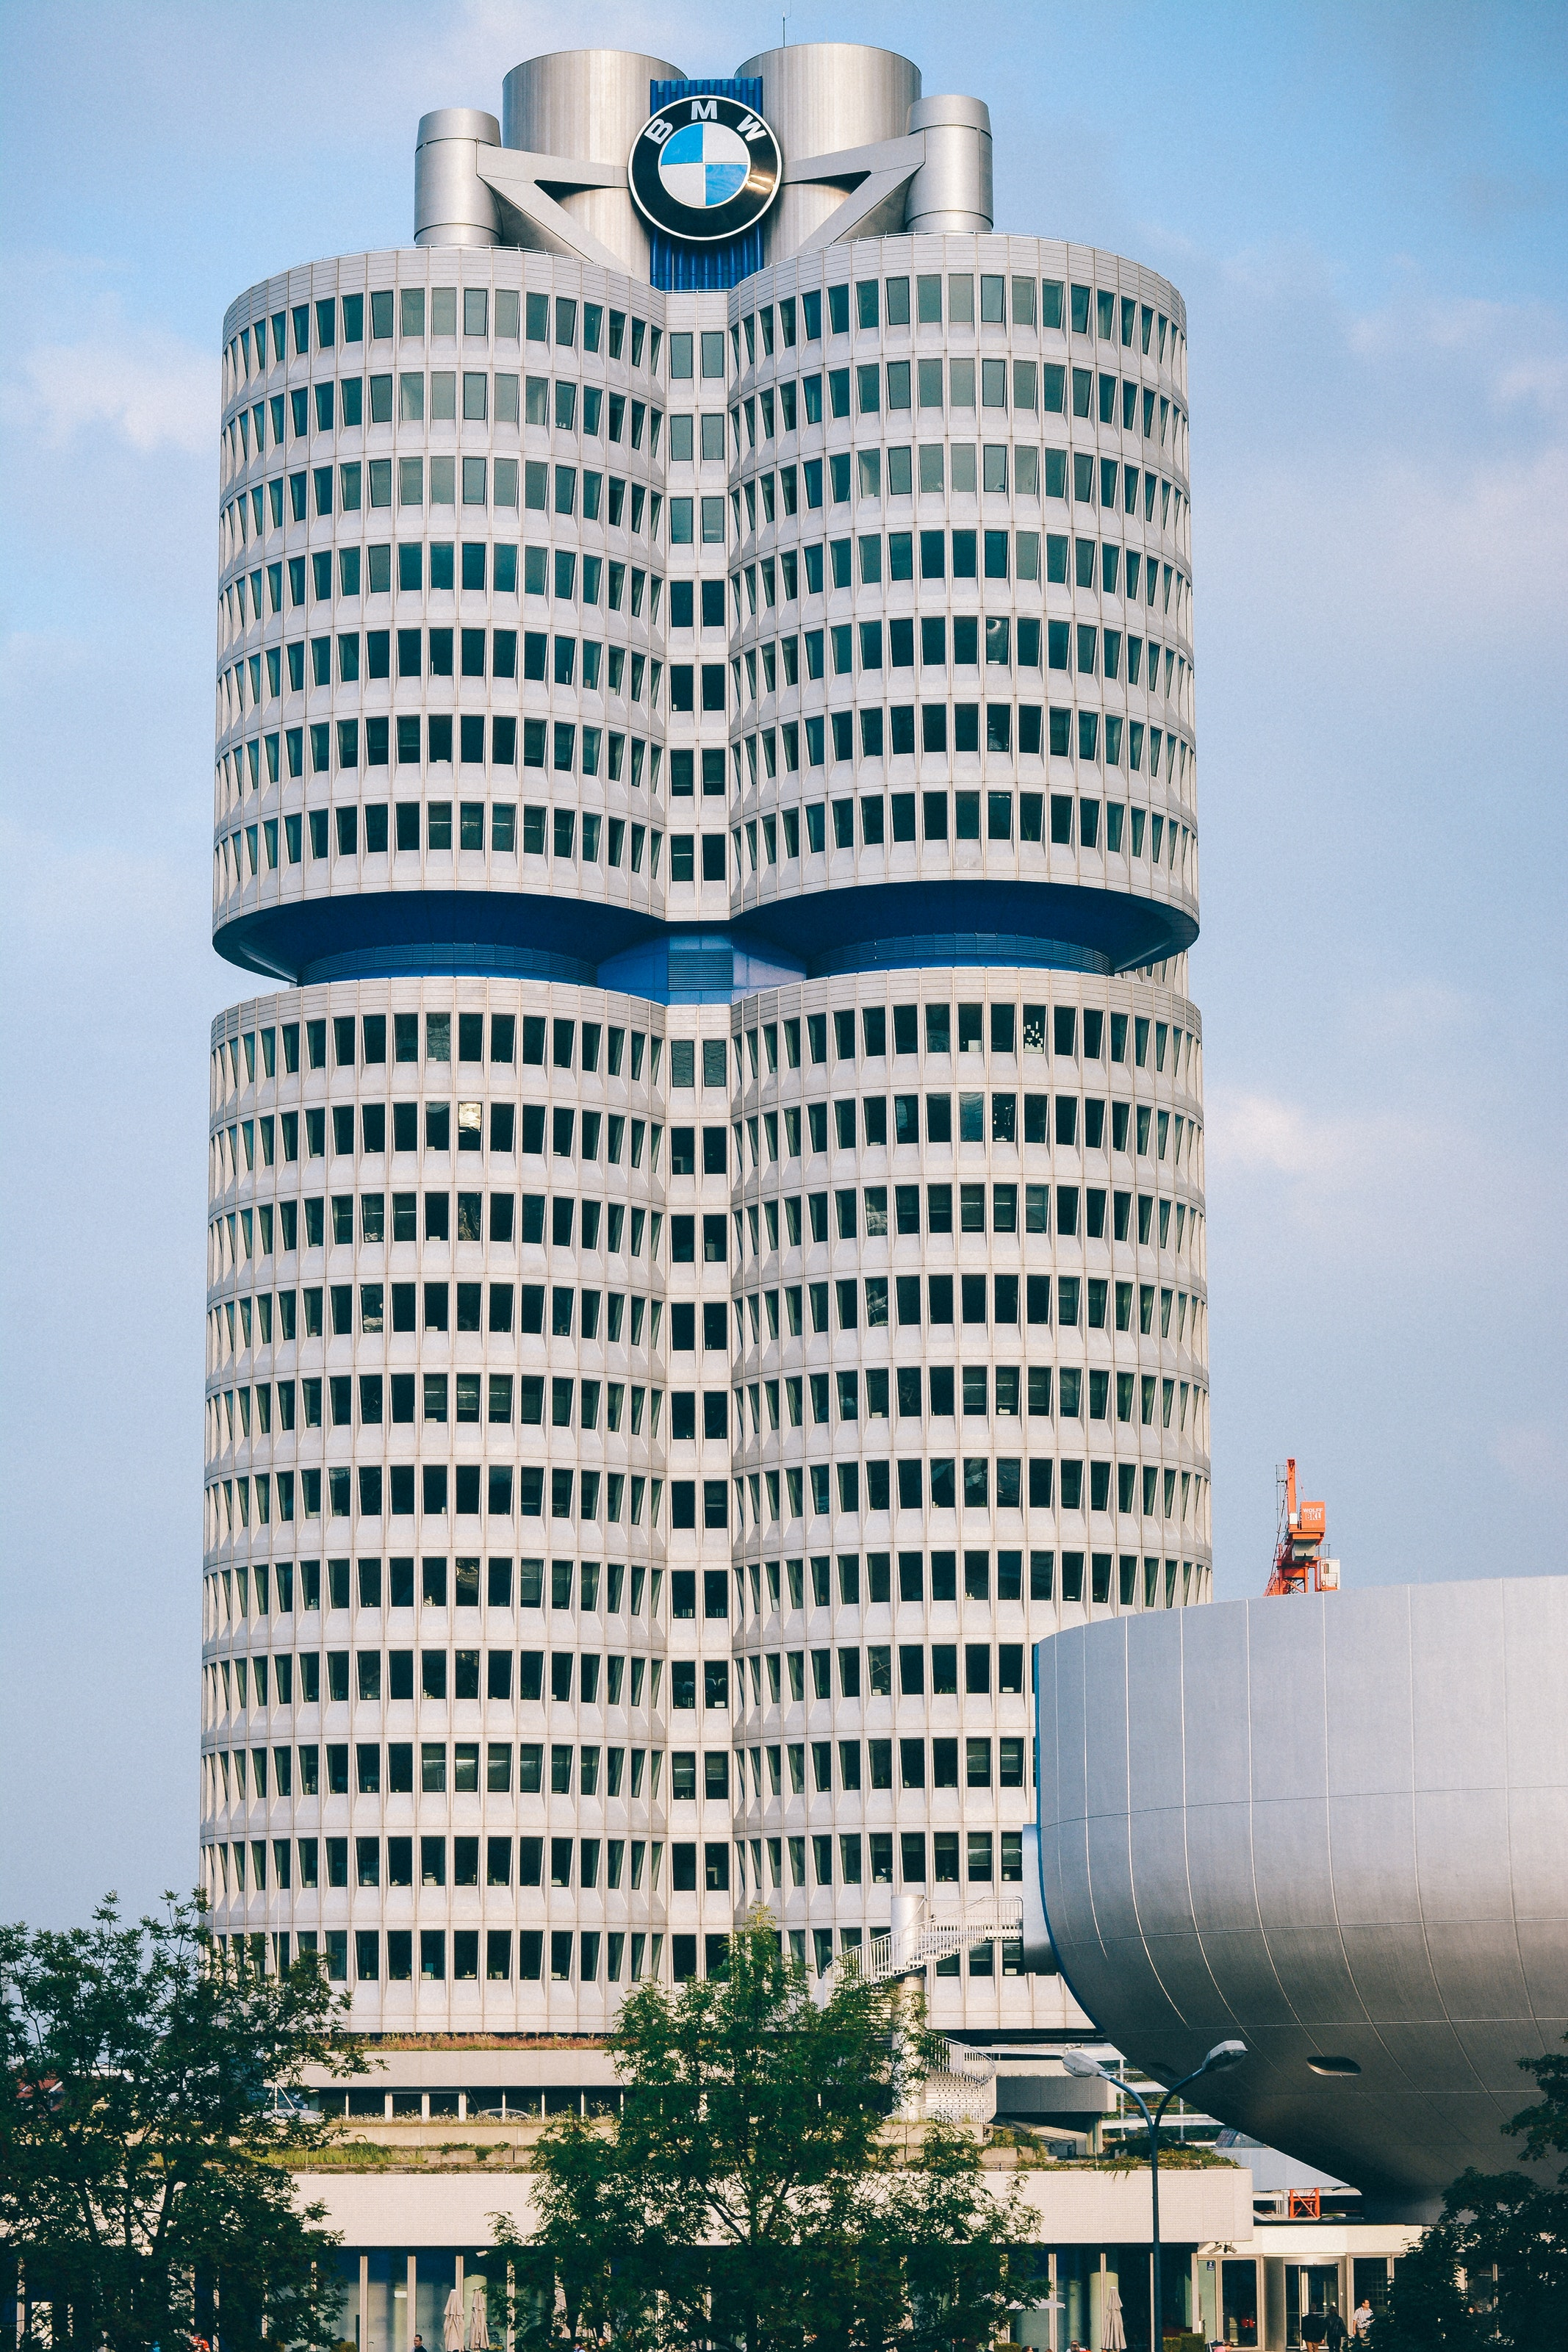 BMW-Welt--M-nchen--Germany-10